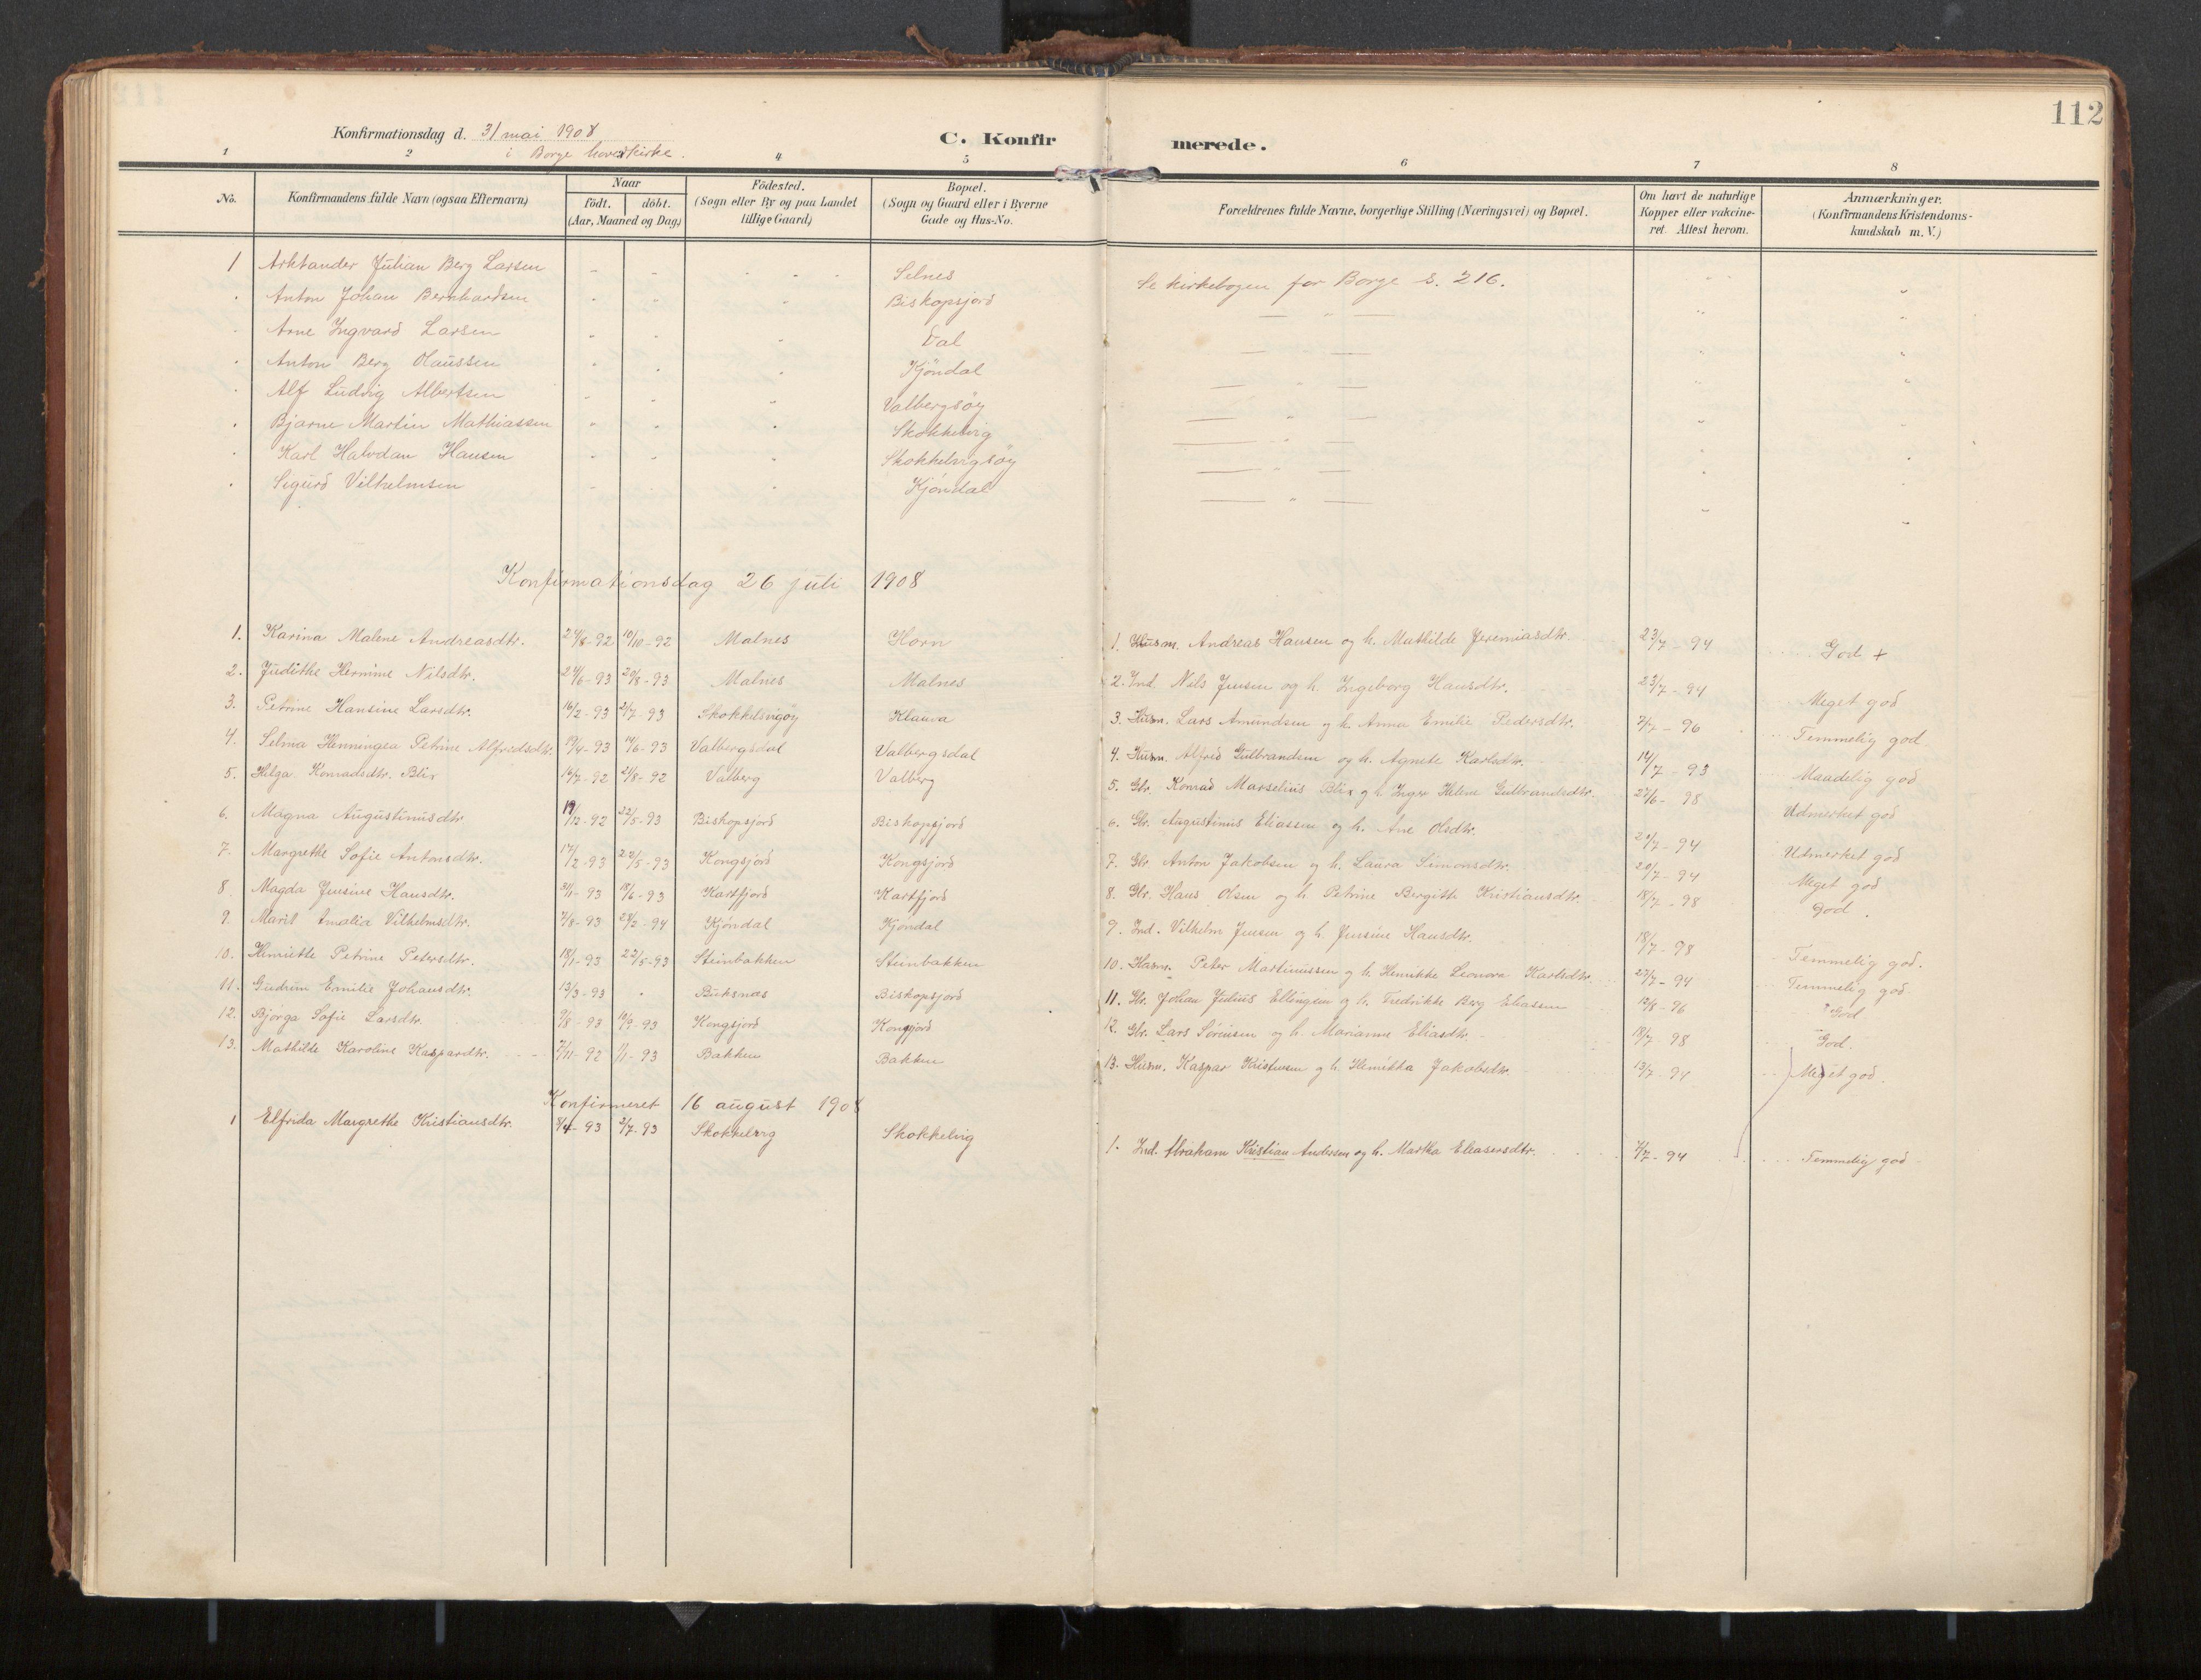 SAT, Ministerialprotokoller, klokkerbøker og fødselsregistre - Nordland, 884/L1194: Ministerialbok nr. 884A02, 1906-1937, s. 112